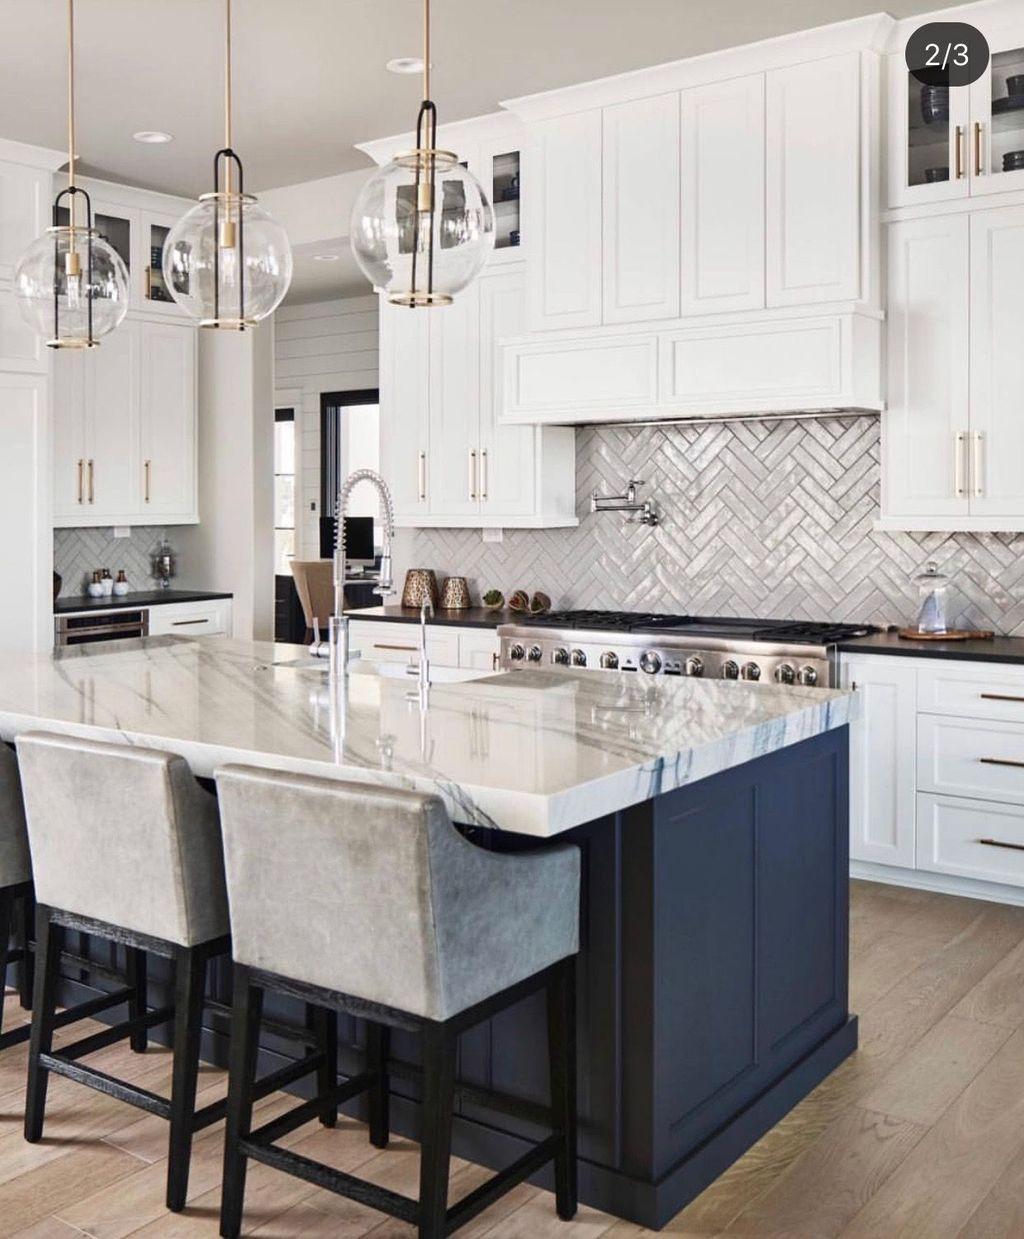 Stunning Glass Backsplash Kitchen Ideas 04